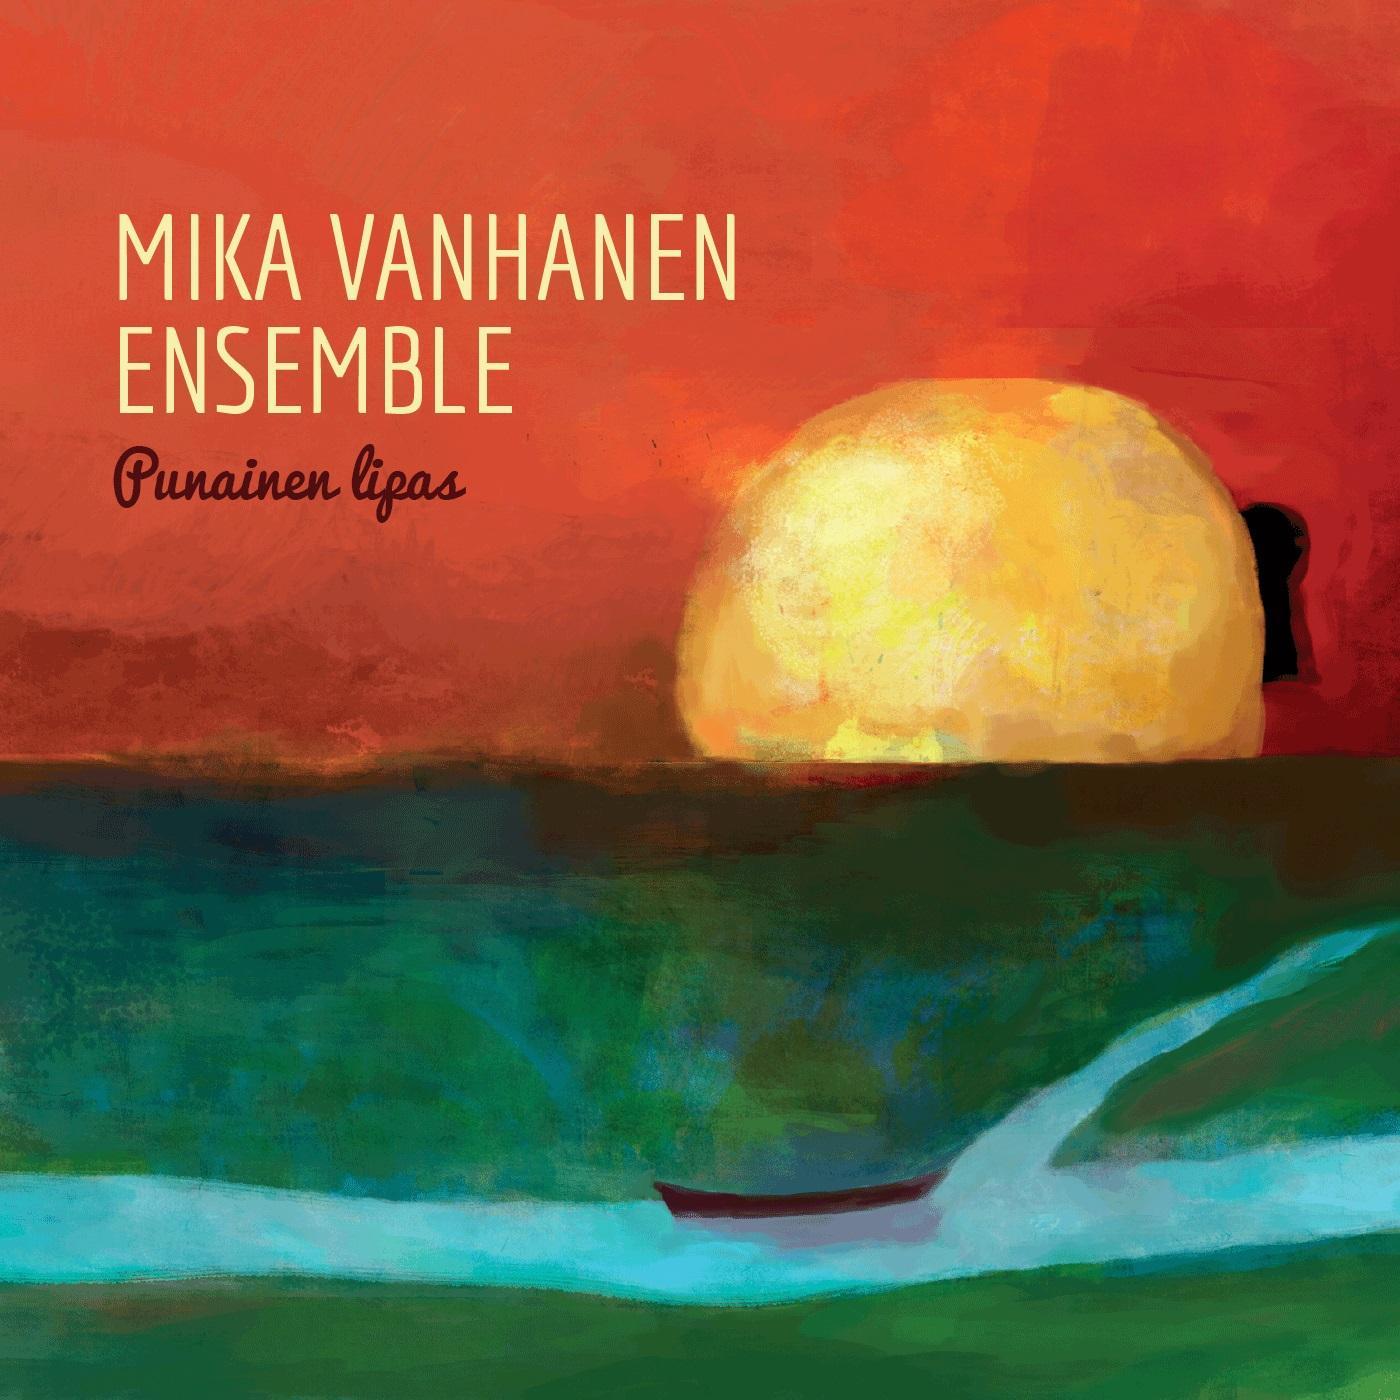 Mika Vanhanen Ensemble: Punainen Lipas